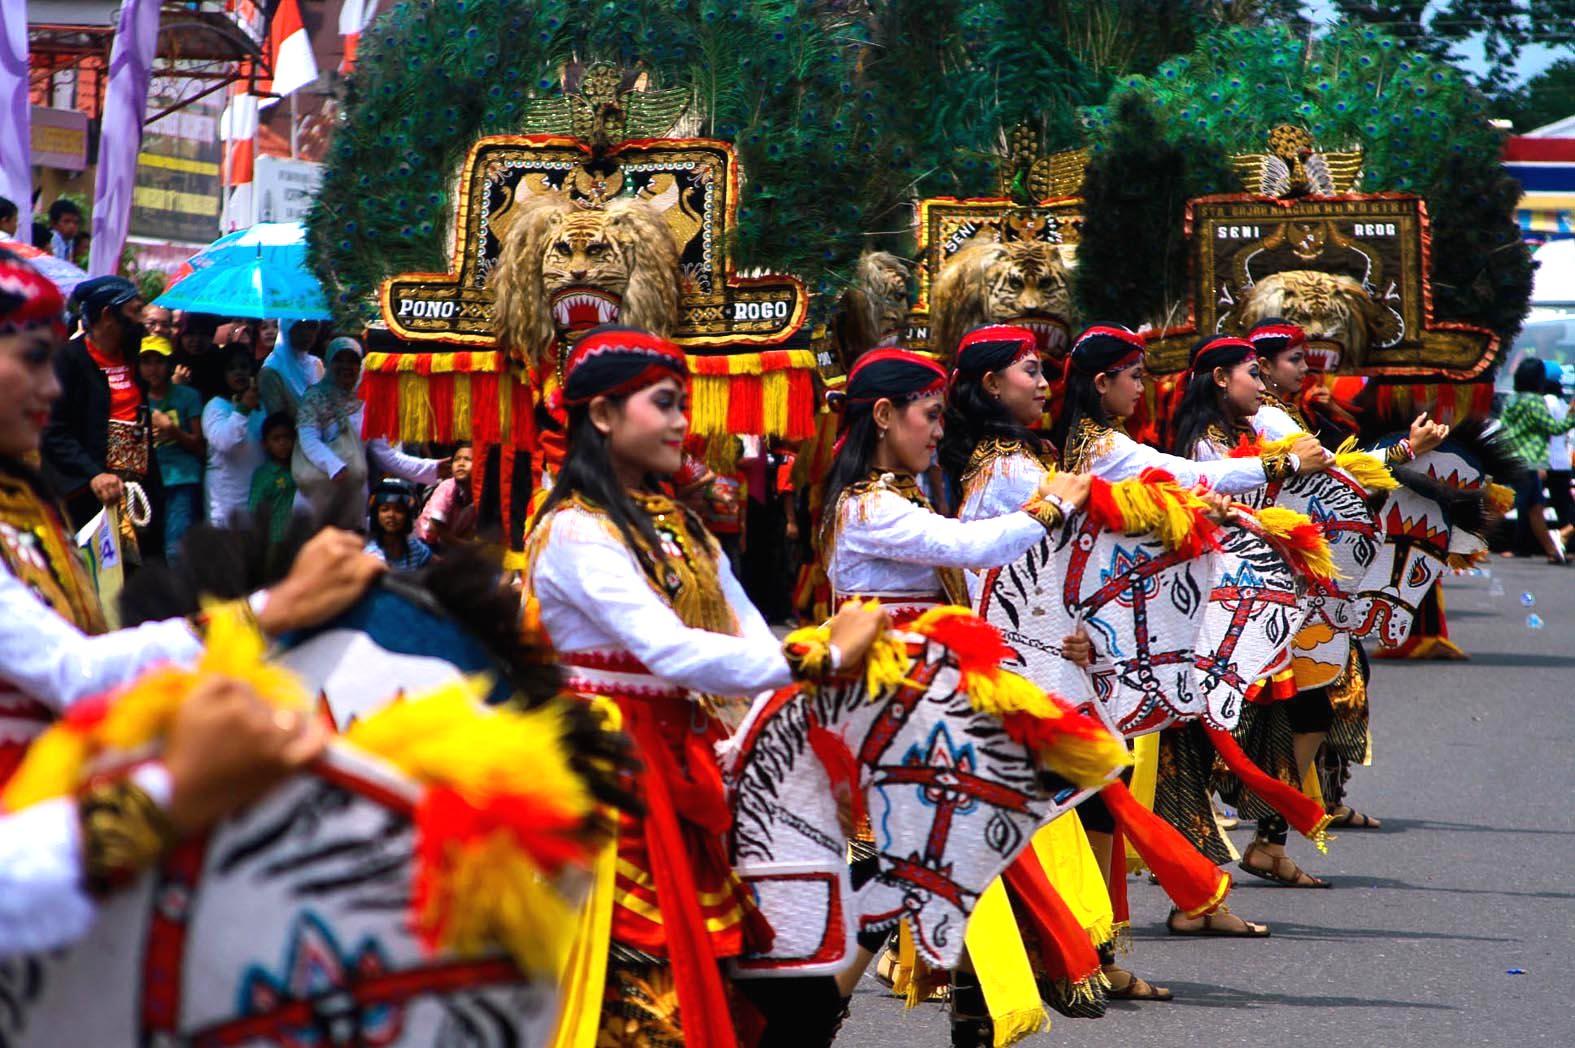 Kelompok Penari Jathilan Grup Reog Ponorogo  khabarJOSS.com